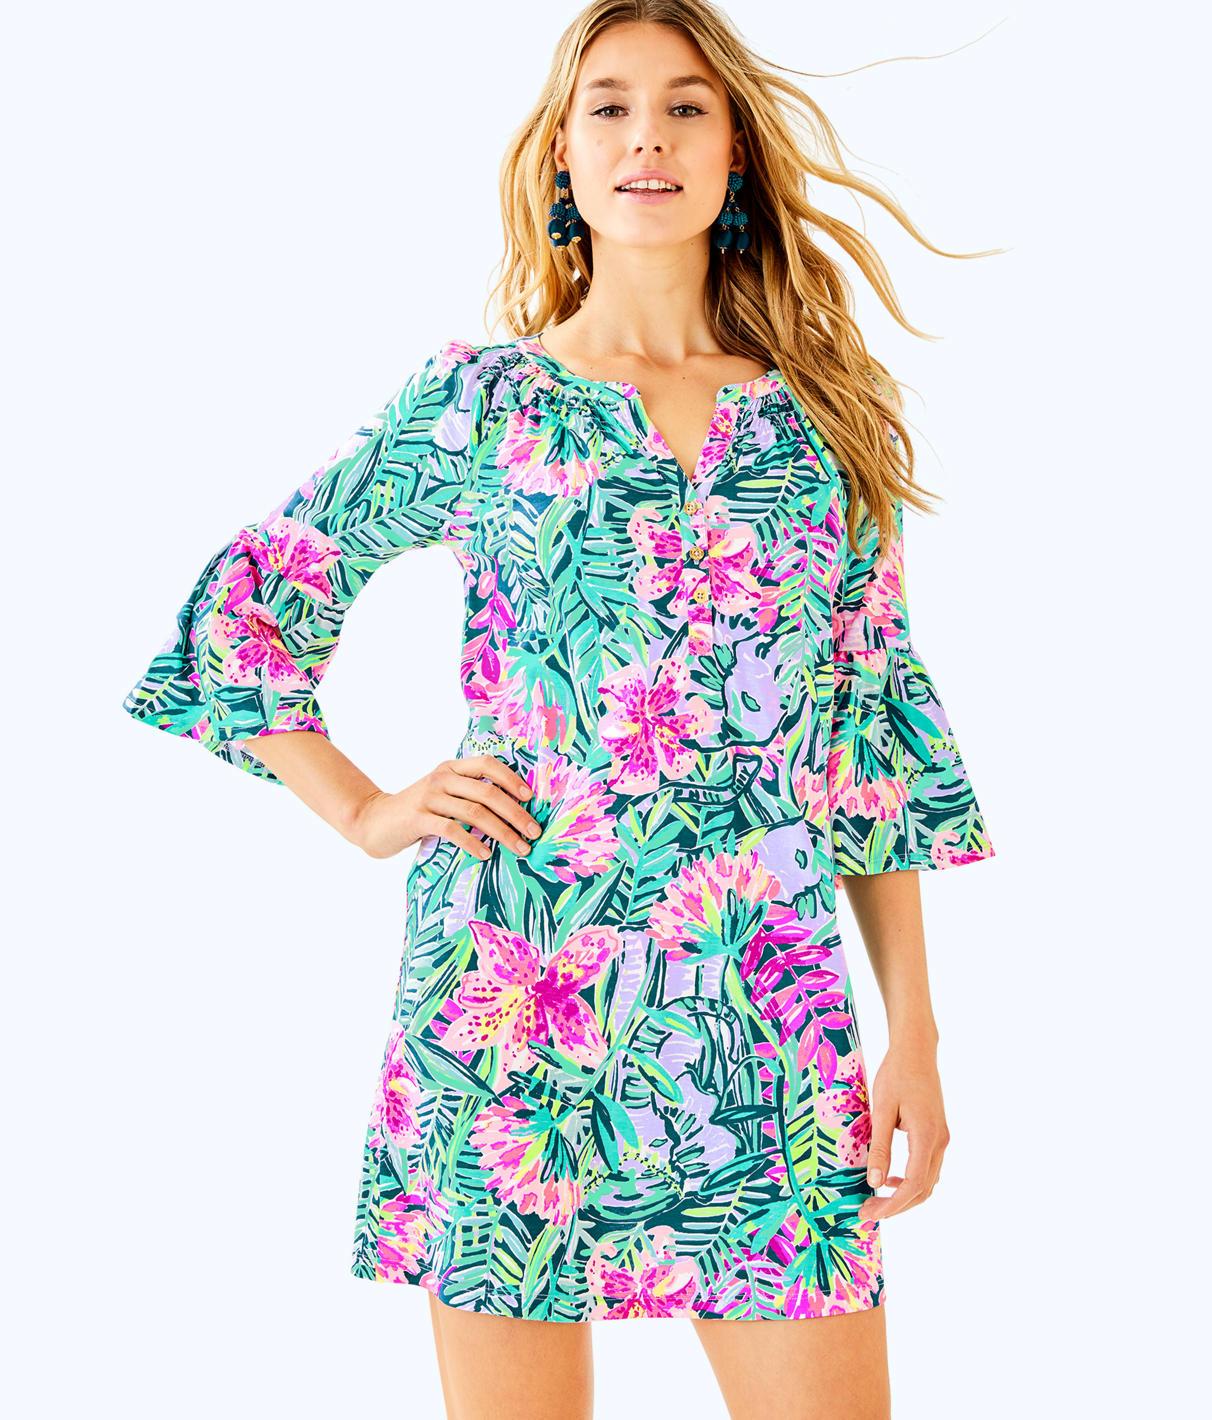 Lilly Pulitzer Teigen Dress